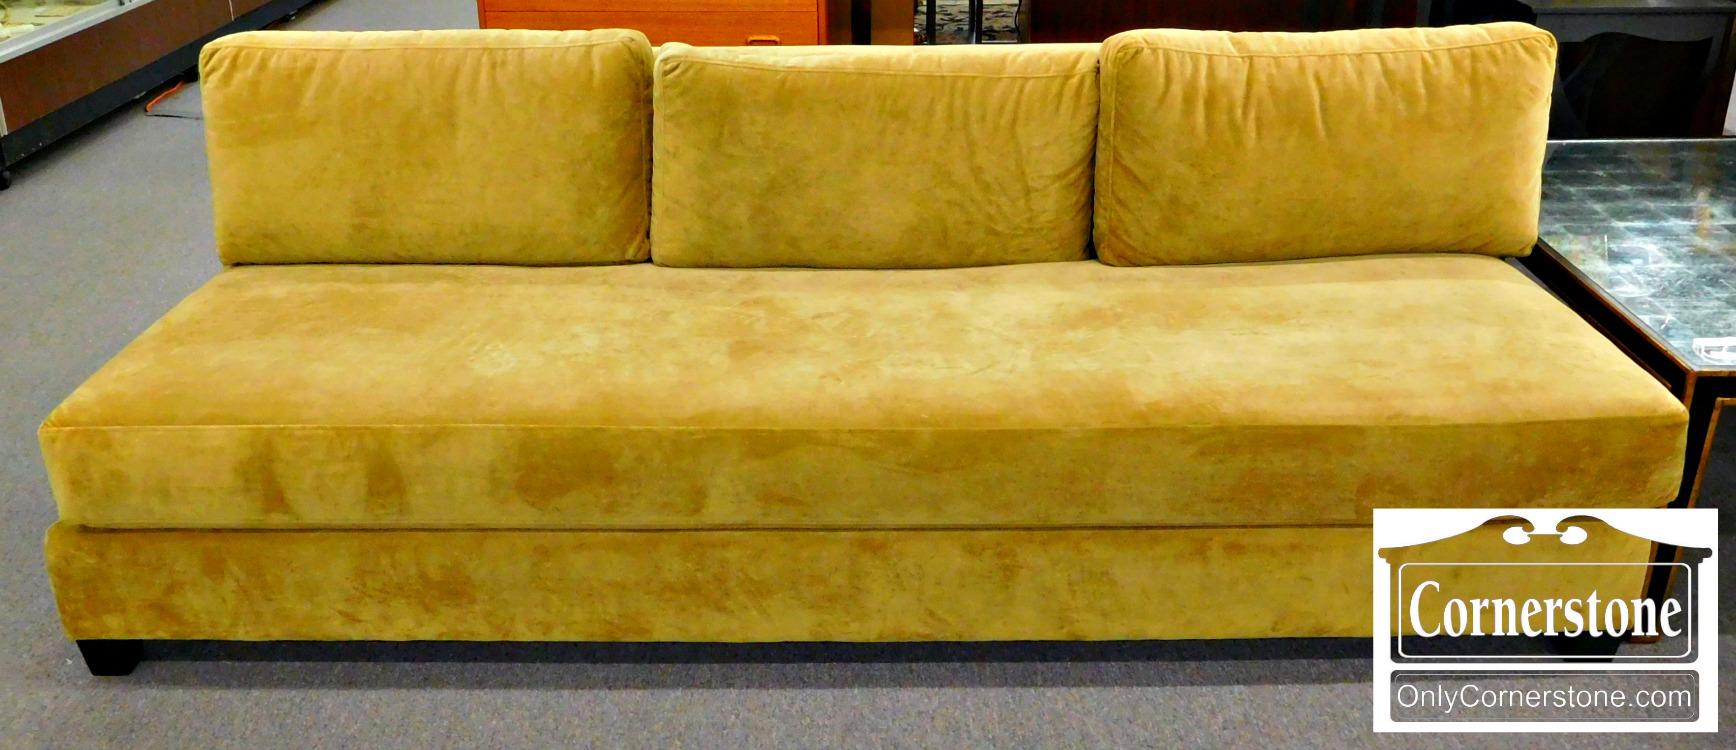 Sofas loveseats baltimore maryland furniture store for Designer sofas for less